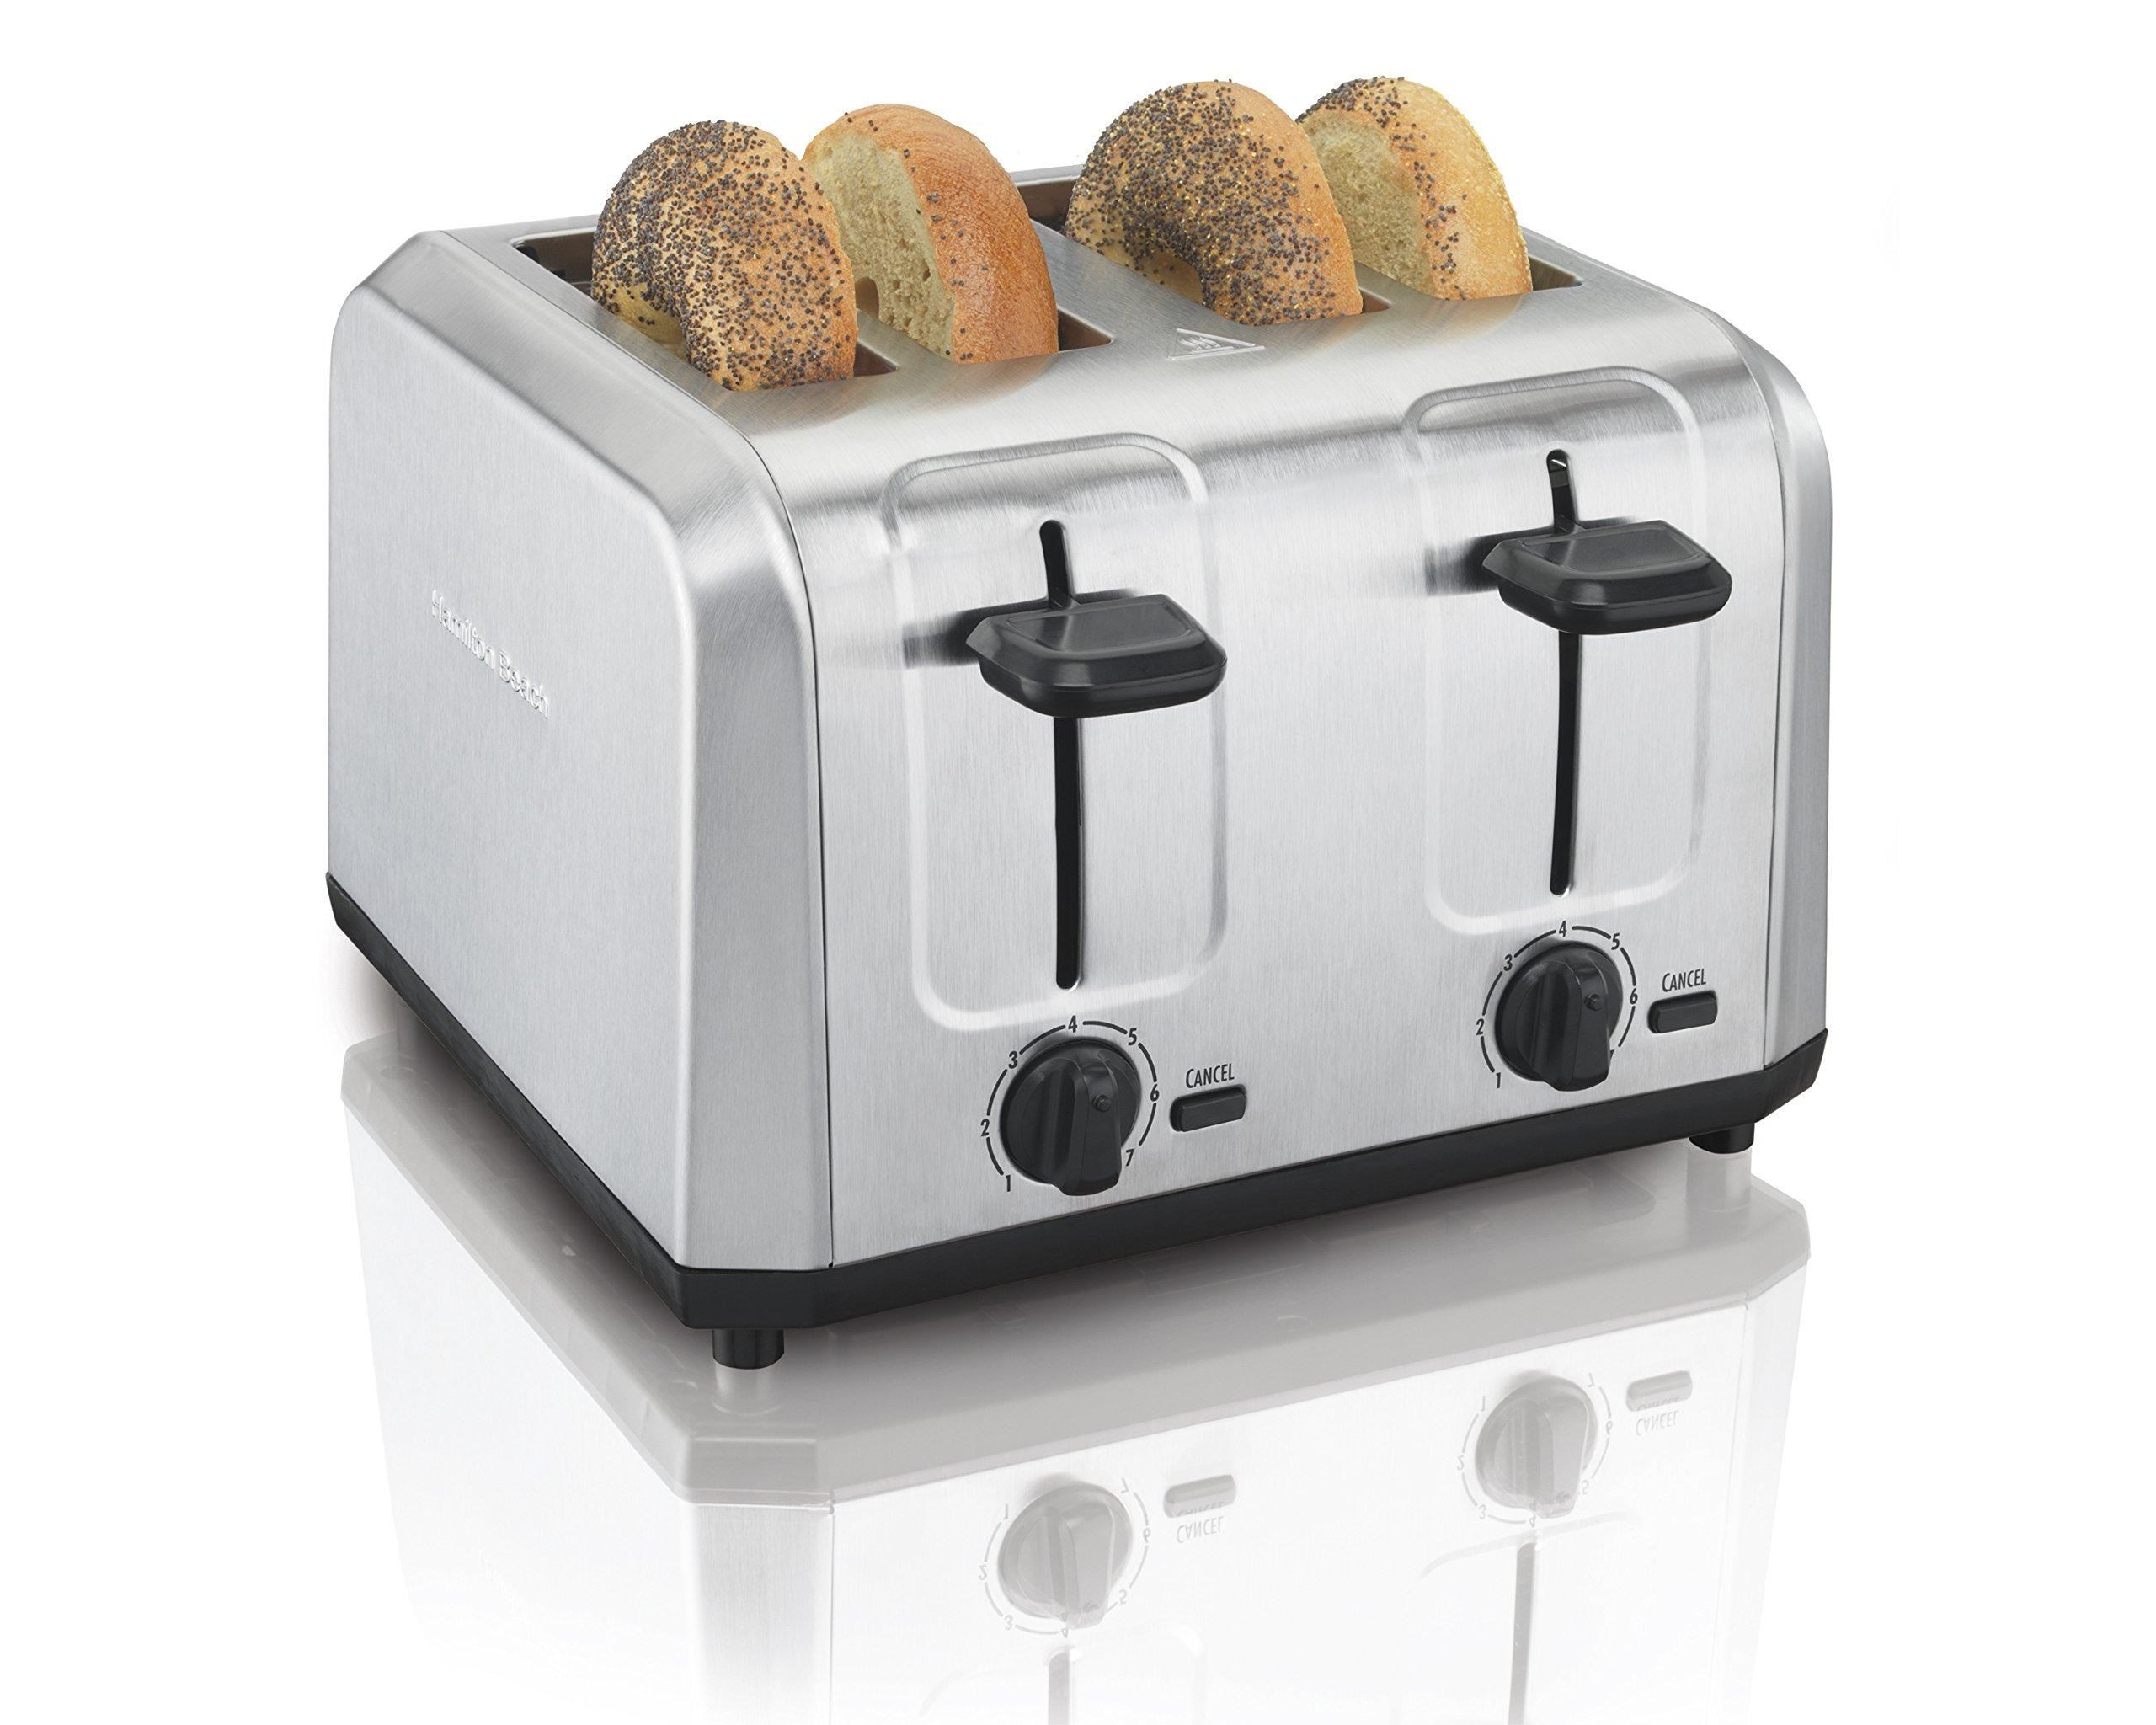 Hamilton Beach Brushed Stainless Steel 4-Slice Toaster (24910)